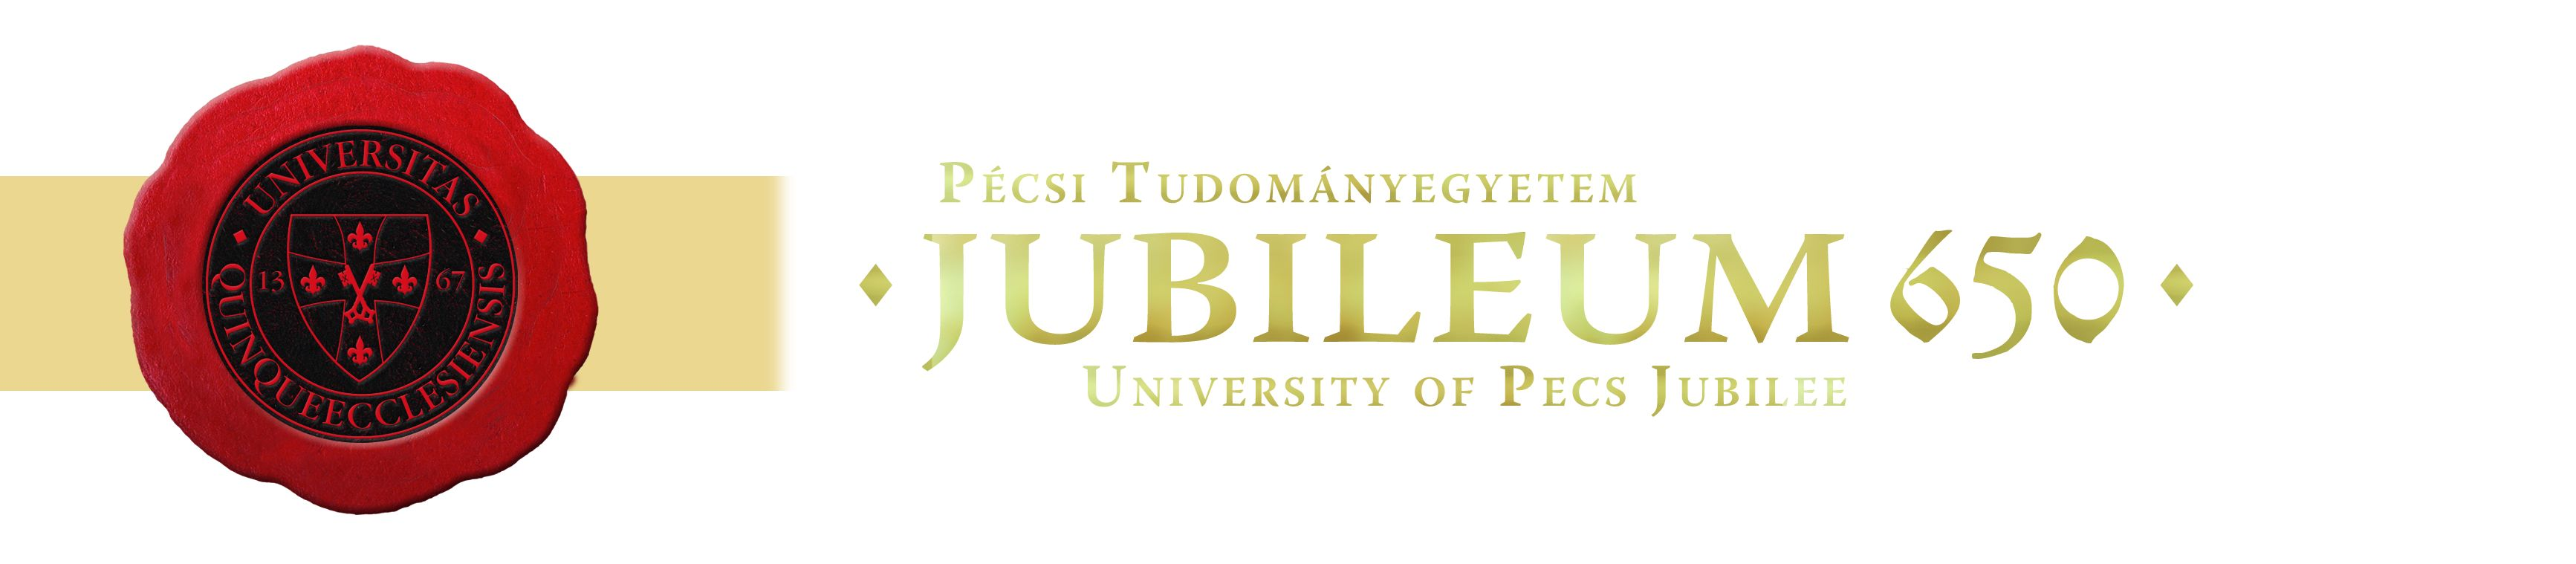 jubileum650-logo-pecset-feher-160501_2.jpg